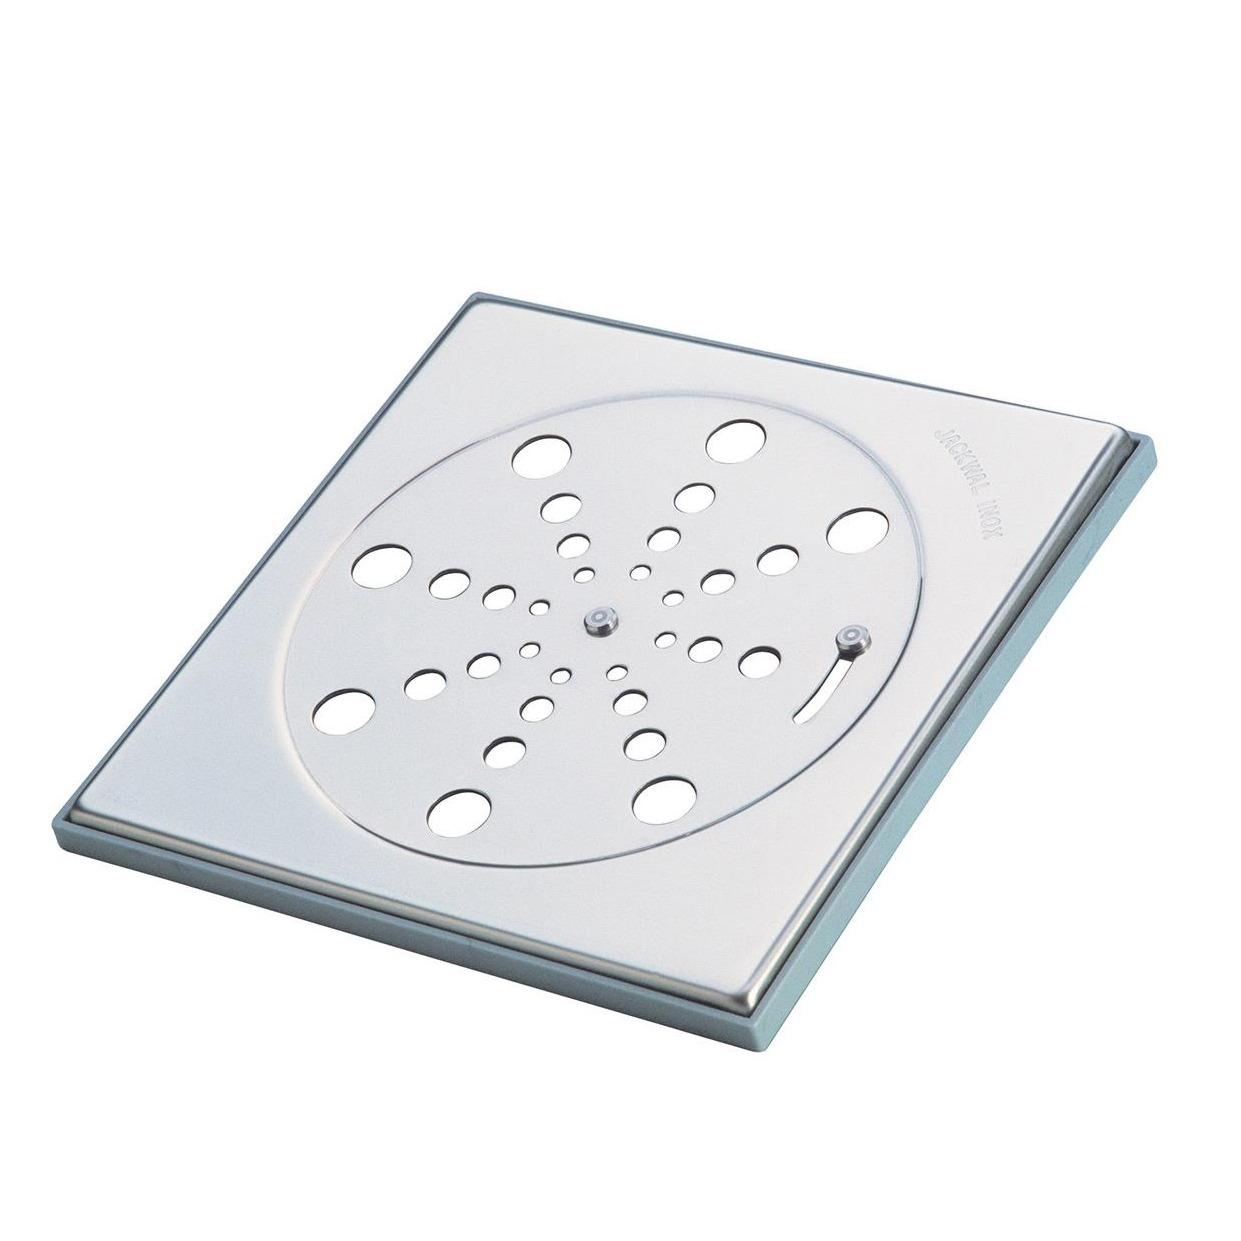 Grelha de Inox Quadrada para Esgoto Fecho 10cm 002924 - Jackwal